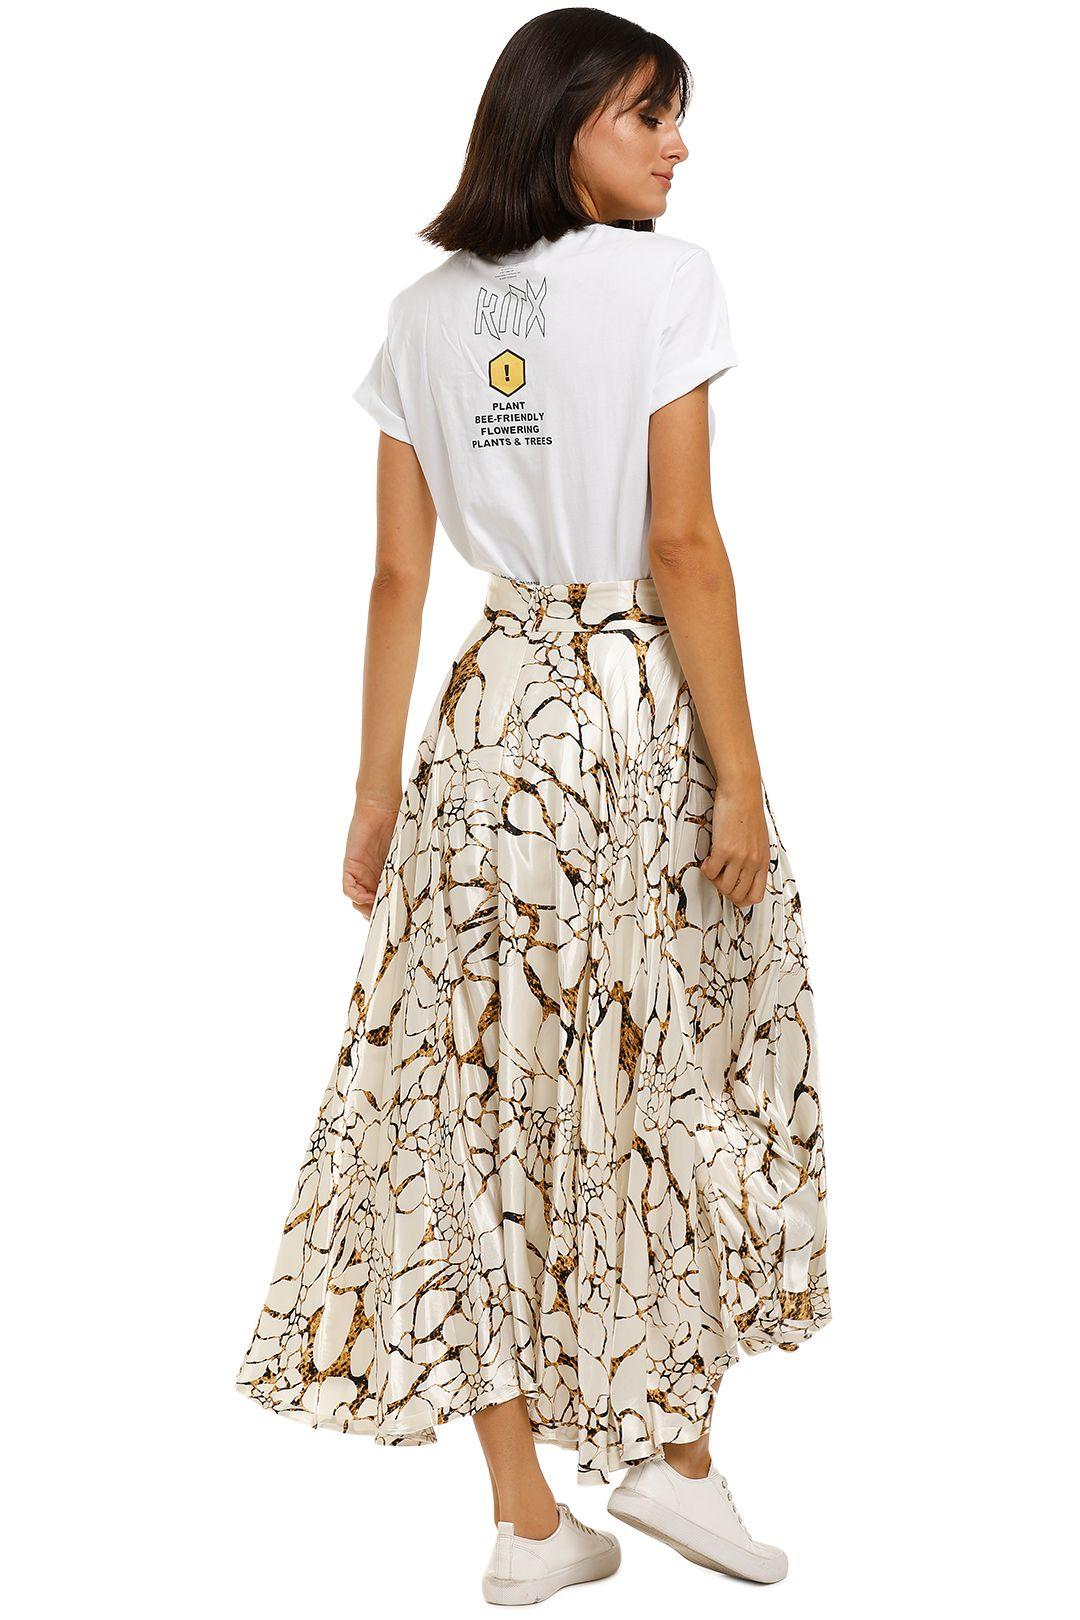 KITX-Carbon-Sink-Circle-Skirt-Carbon-Print-Back